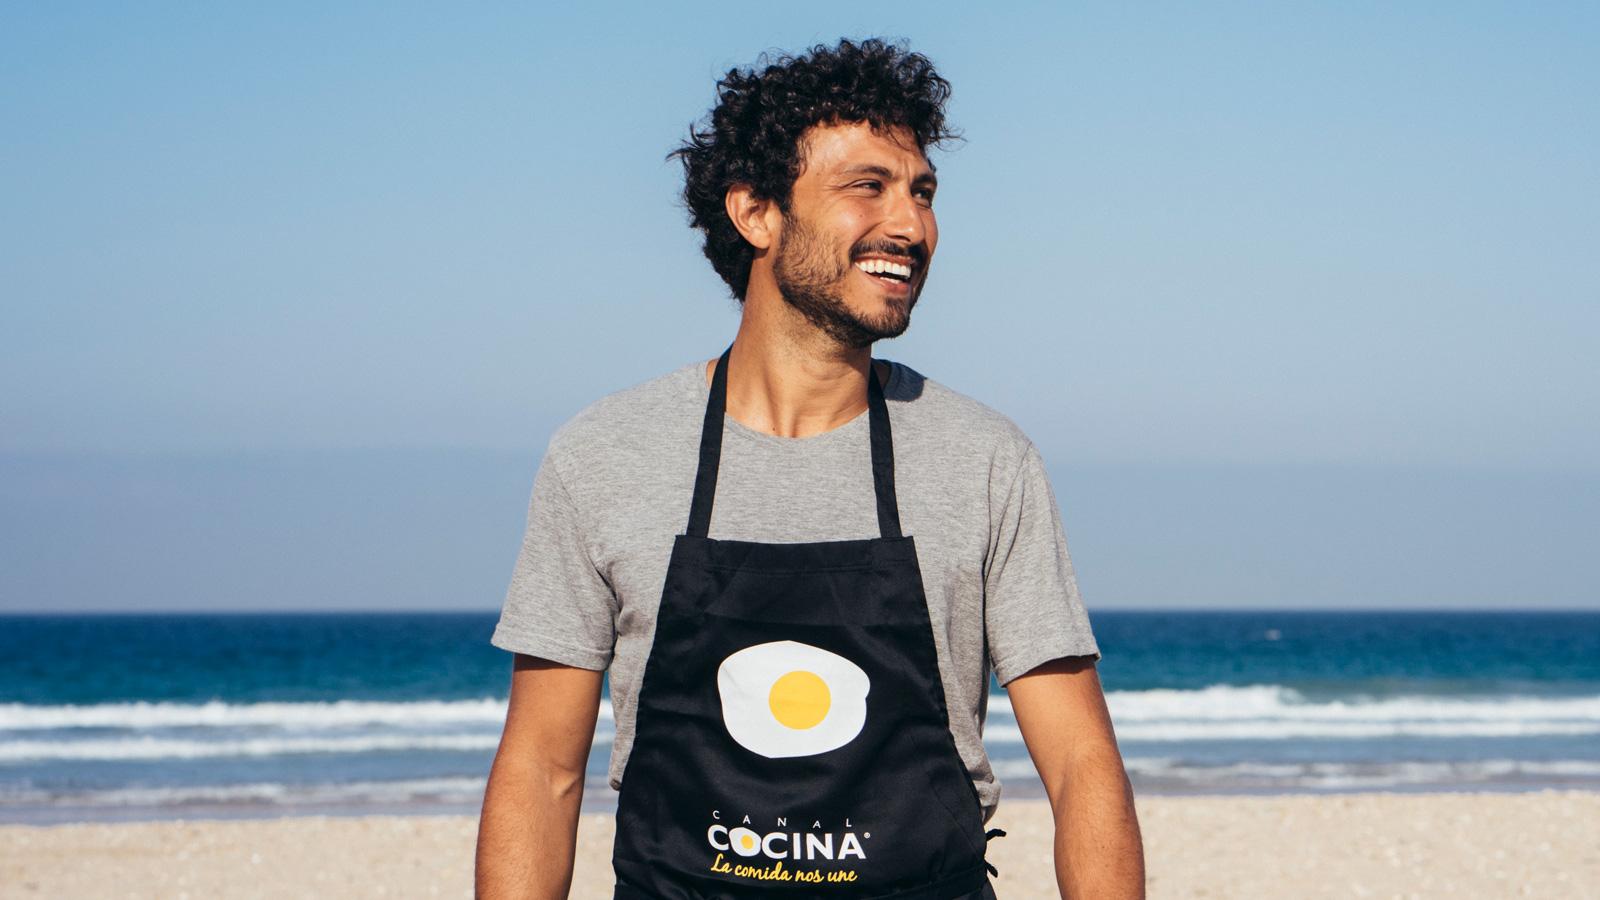 Jose fuentes cocineros canal cocina for Chema de isidro canal cocina